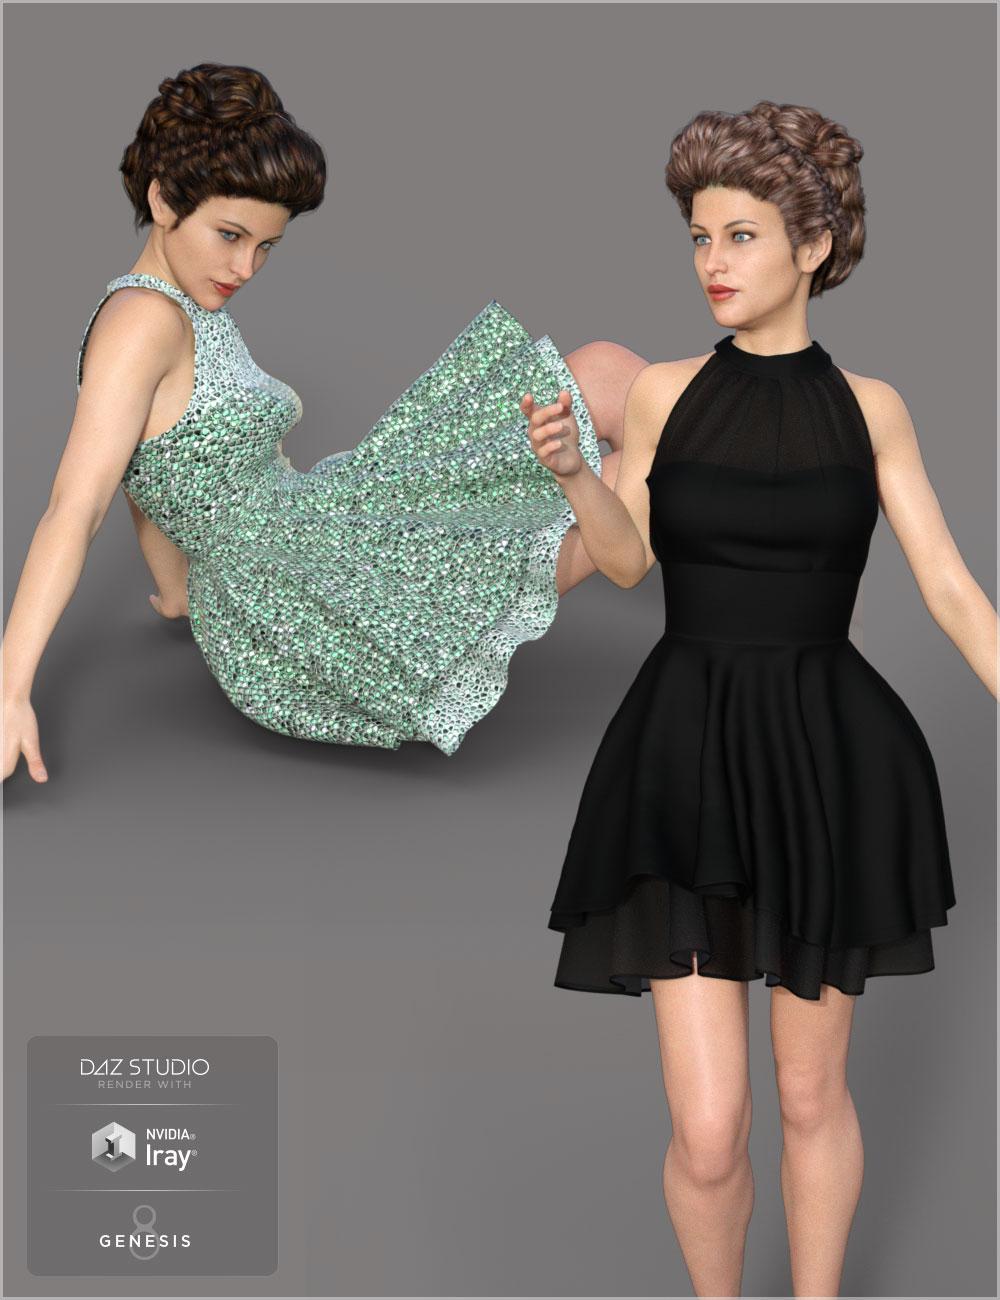 T-Skirt for Genesis 8 Female(s) by: Cute3D, 3D Models by Daz 3D